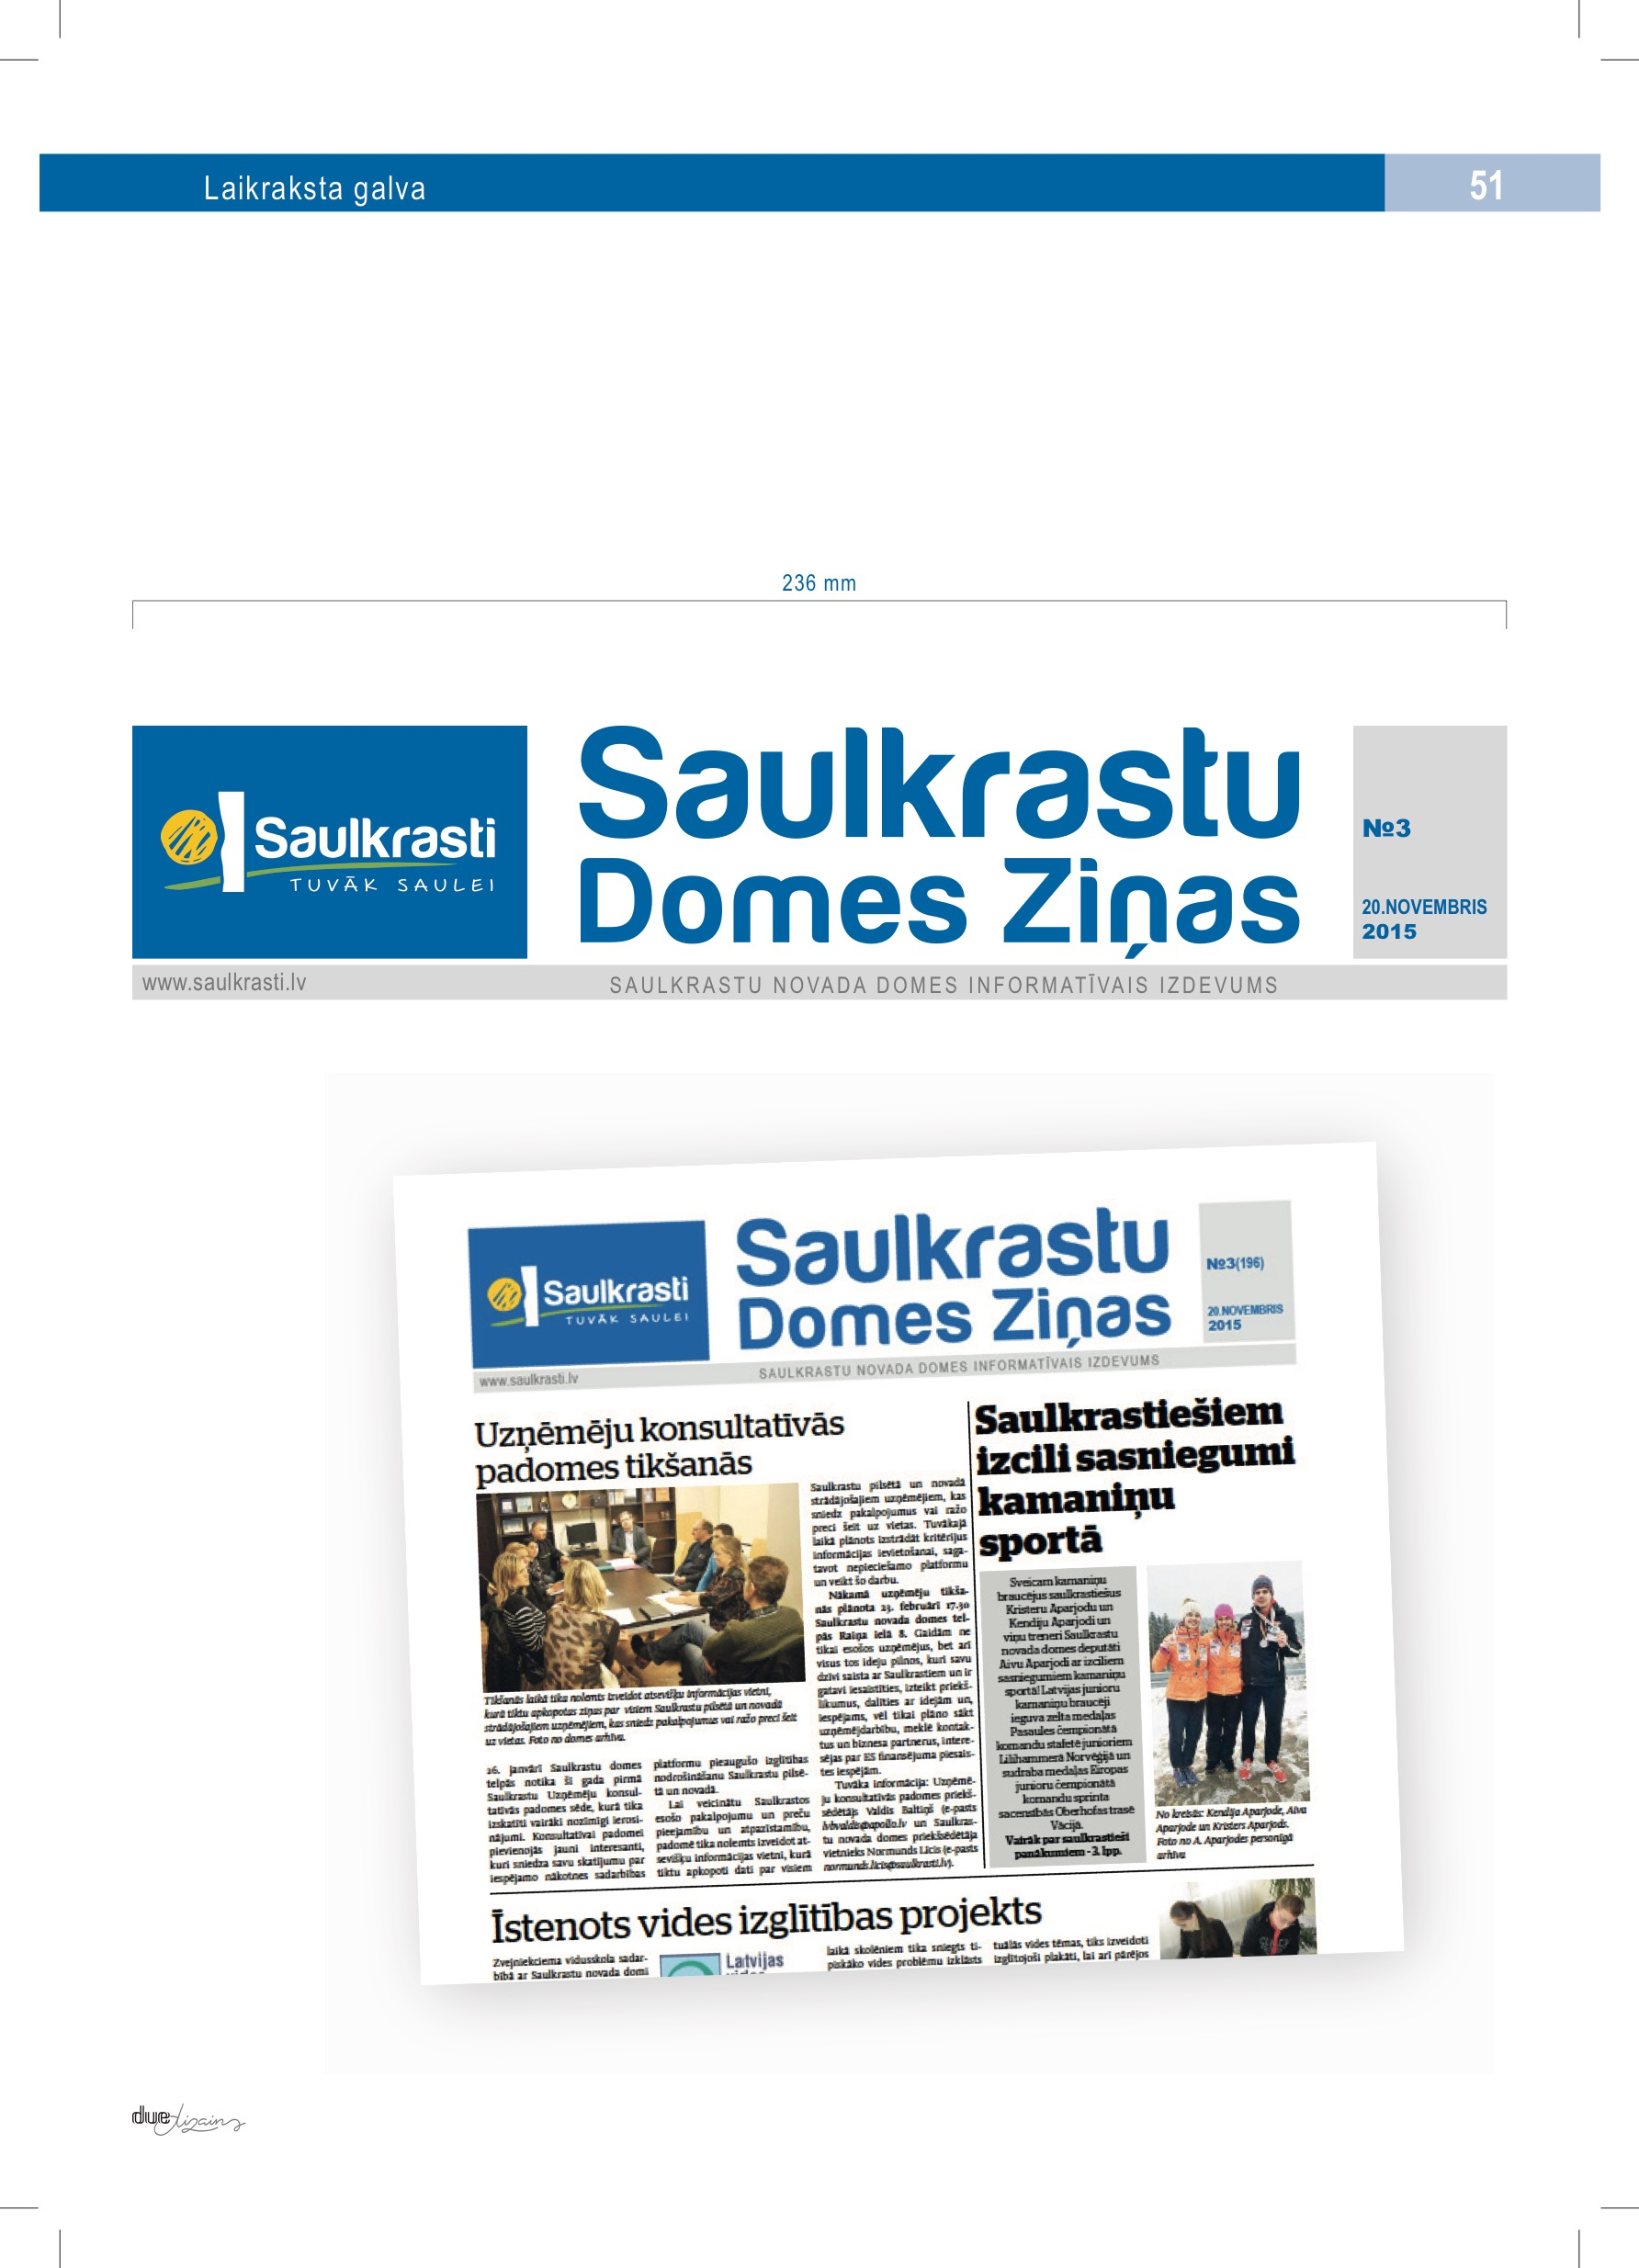 saulkrasti-print 53